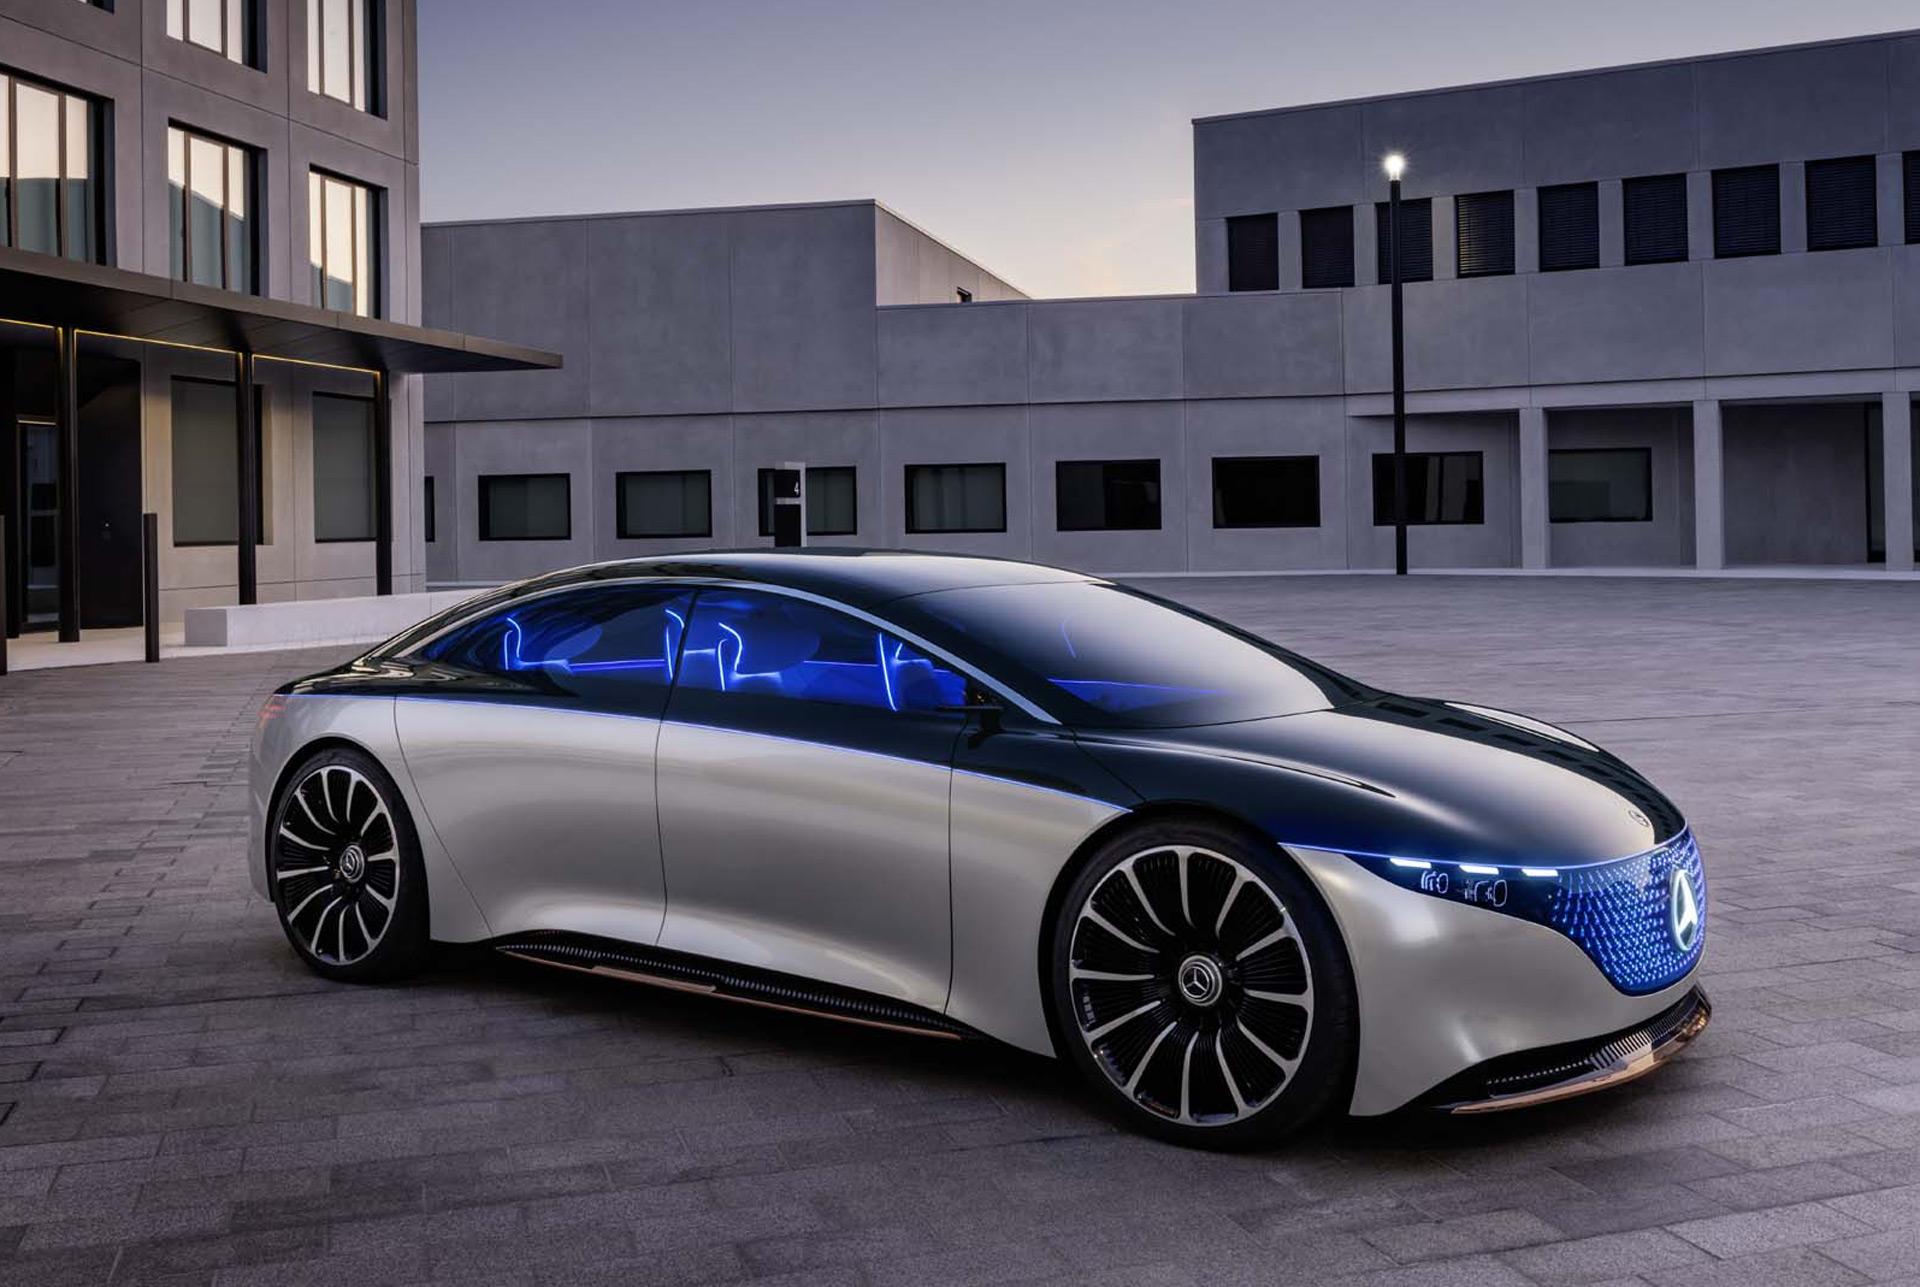 Mercedes Amg Eqs Electric Fastback Could Challenge Tesla Model S Plaid Porsche Taycan